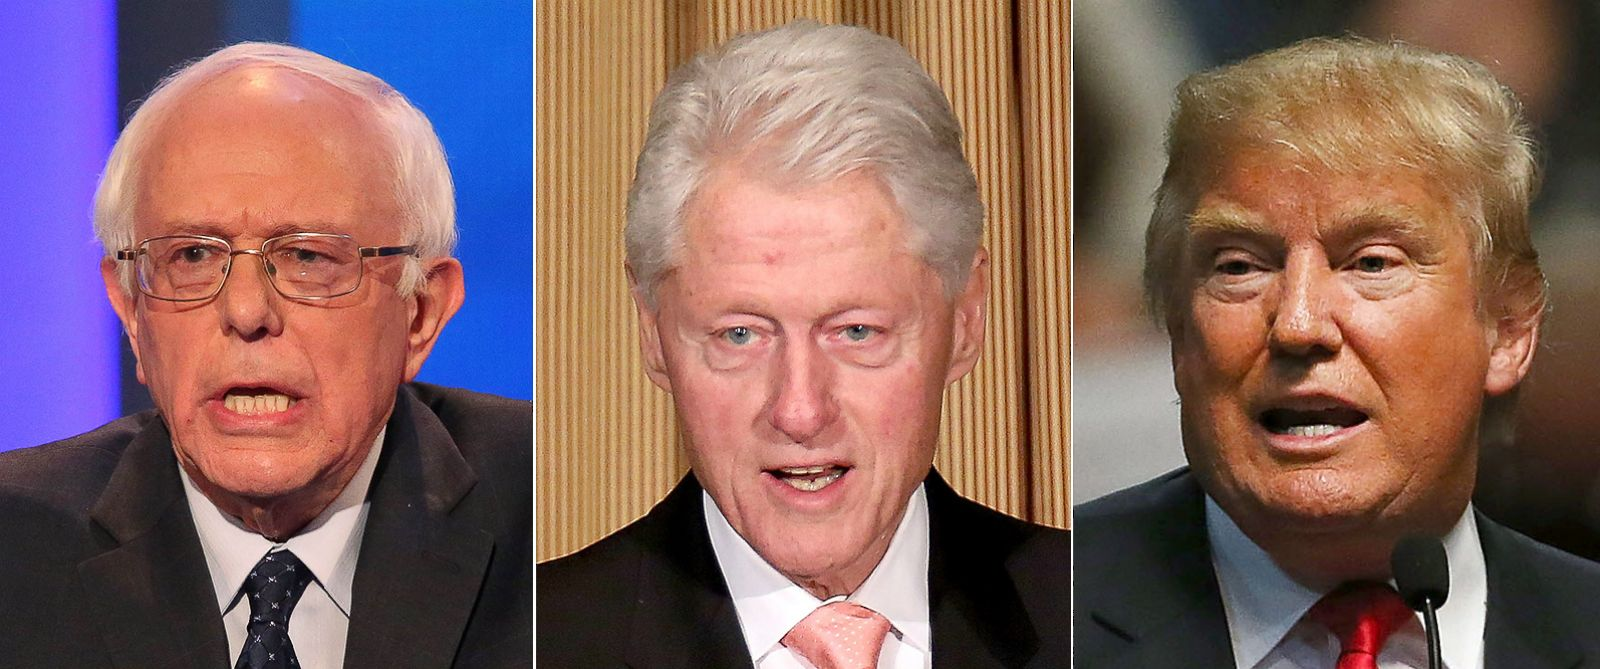 PHOTO: Bernie Sanders | Bill Clinton | Donald Trump